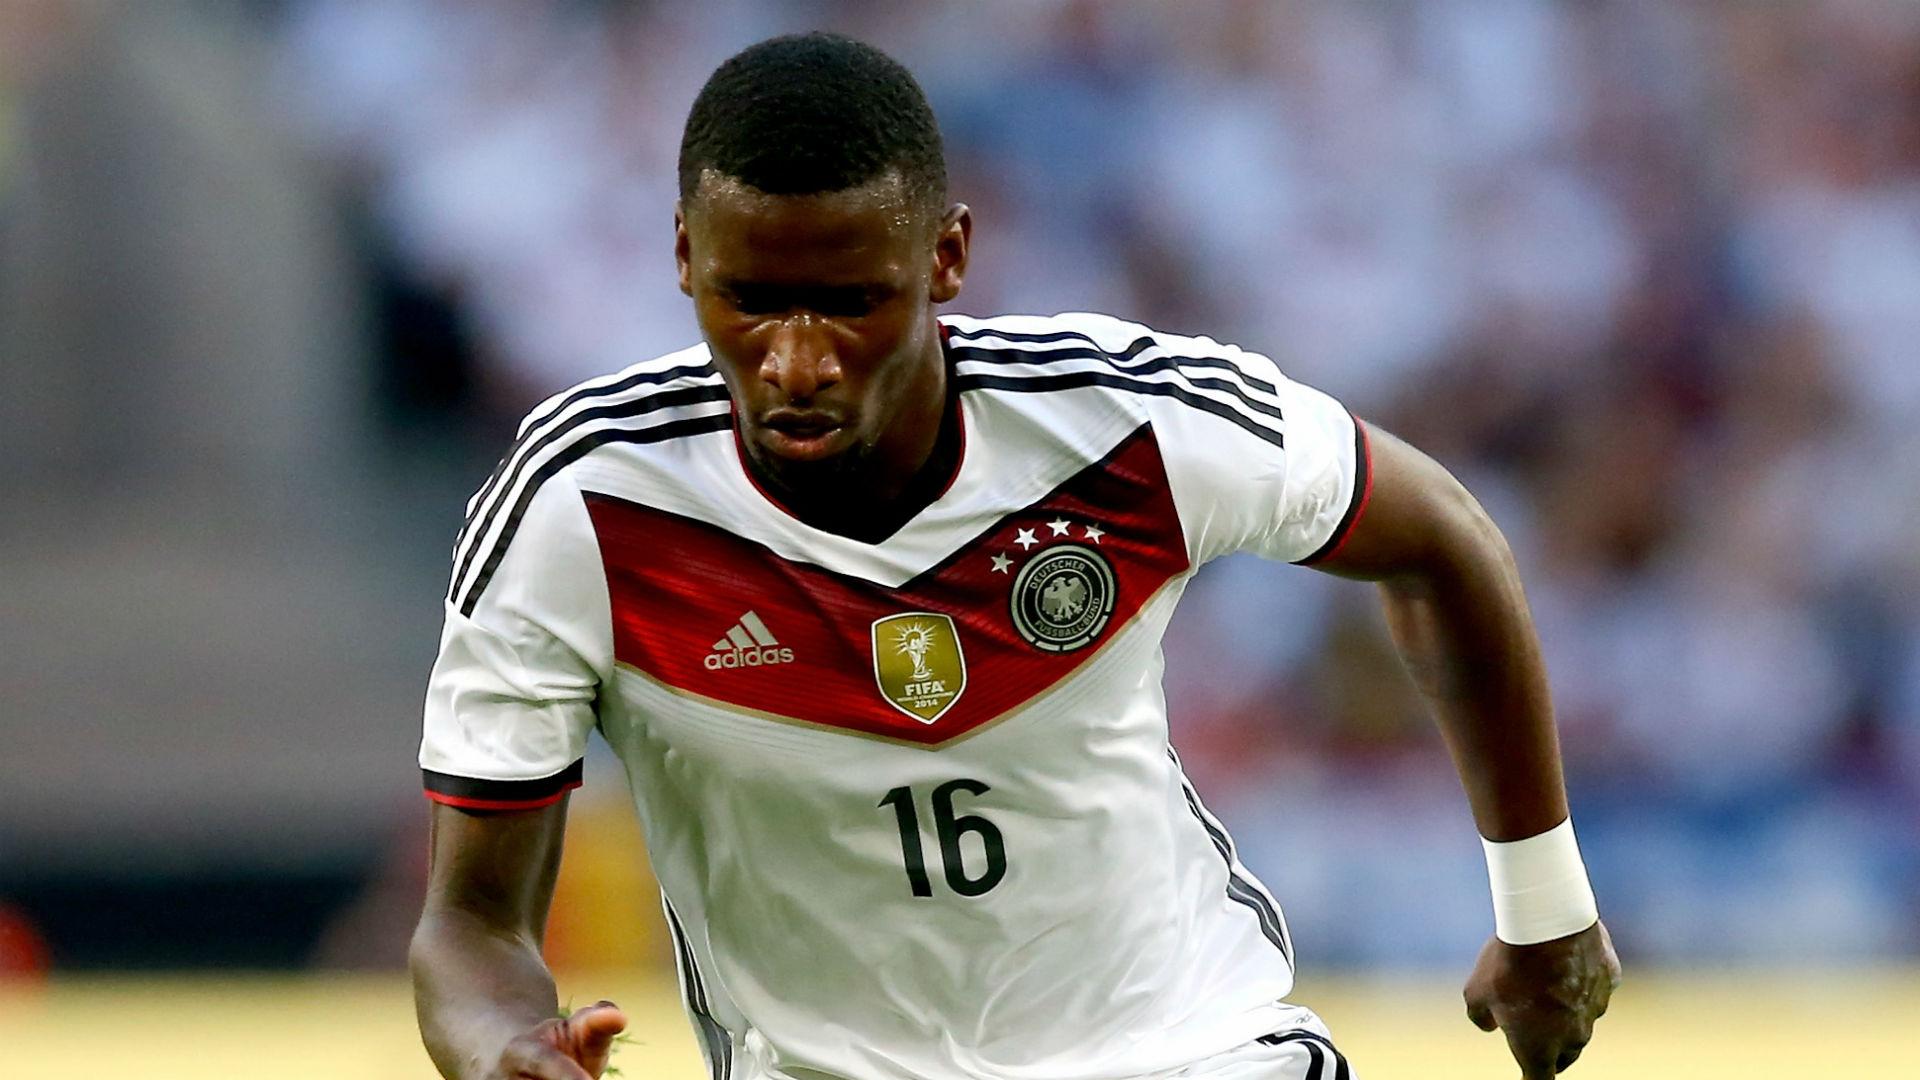 Roma complete Rudiger signing from Stuttgart